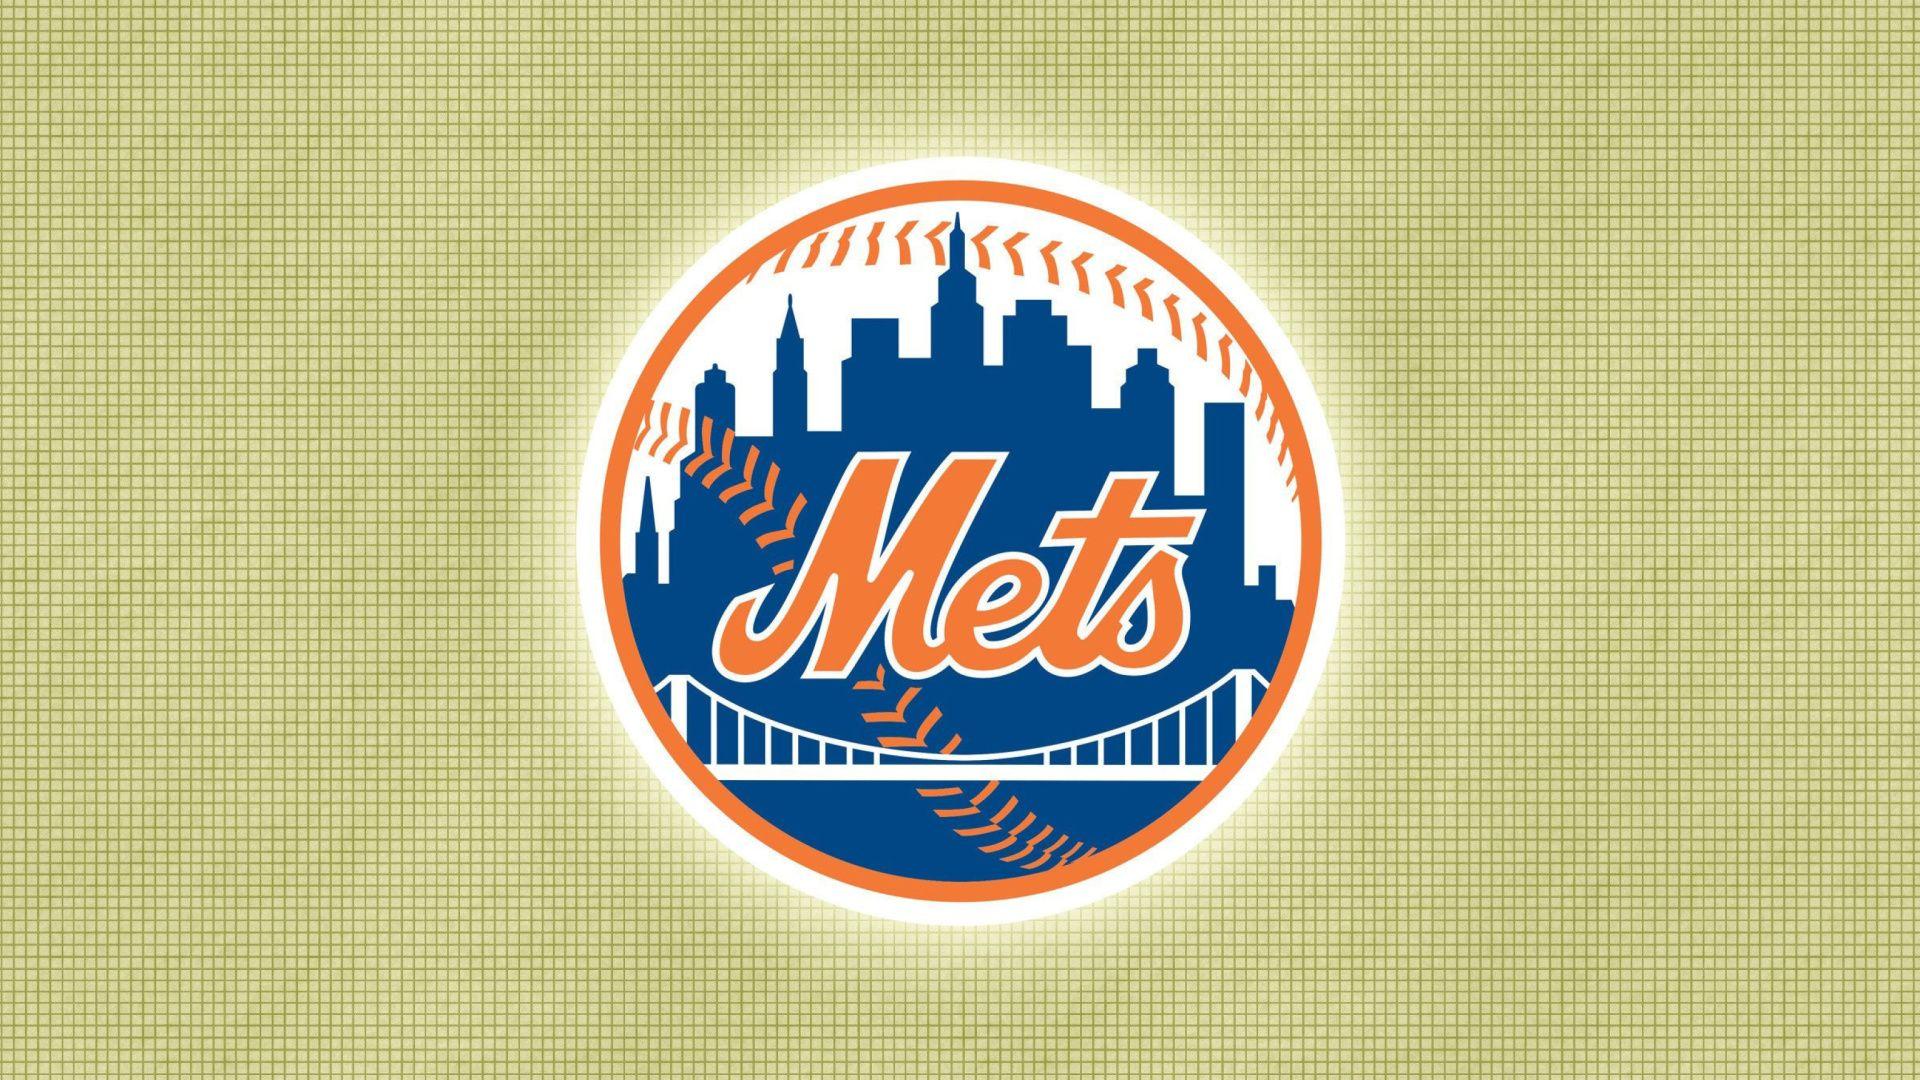 New York Mets wallpaper background